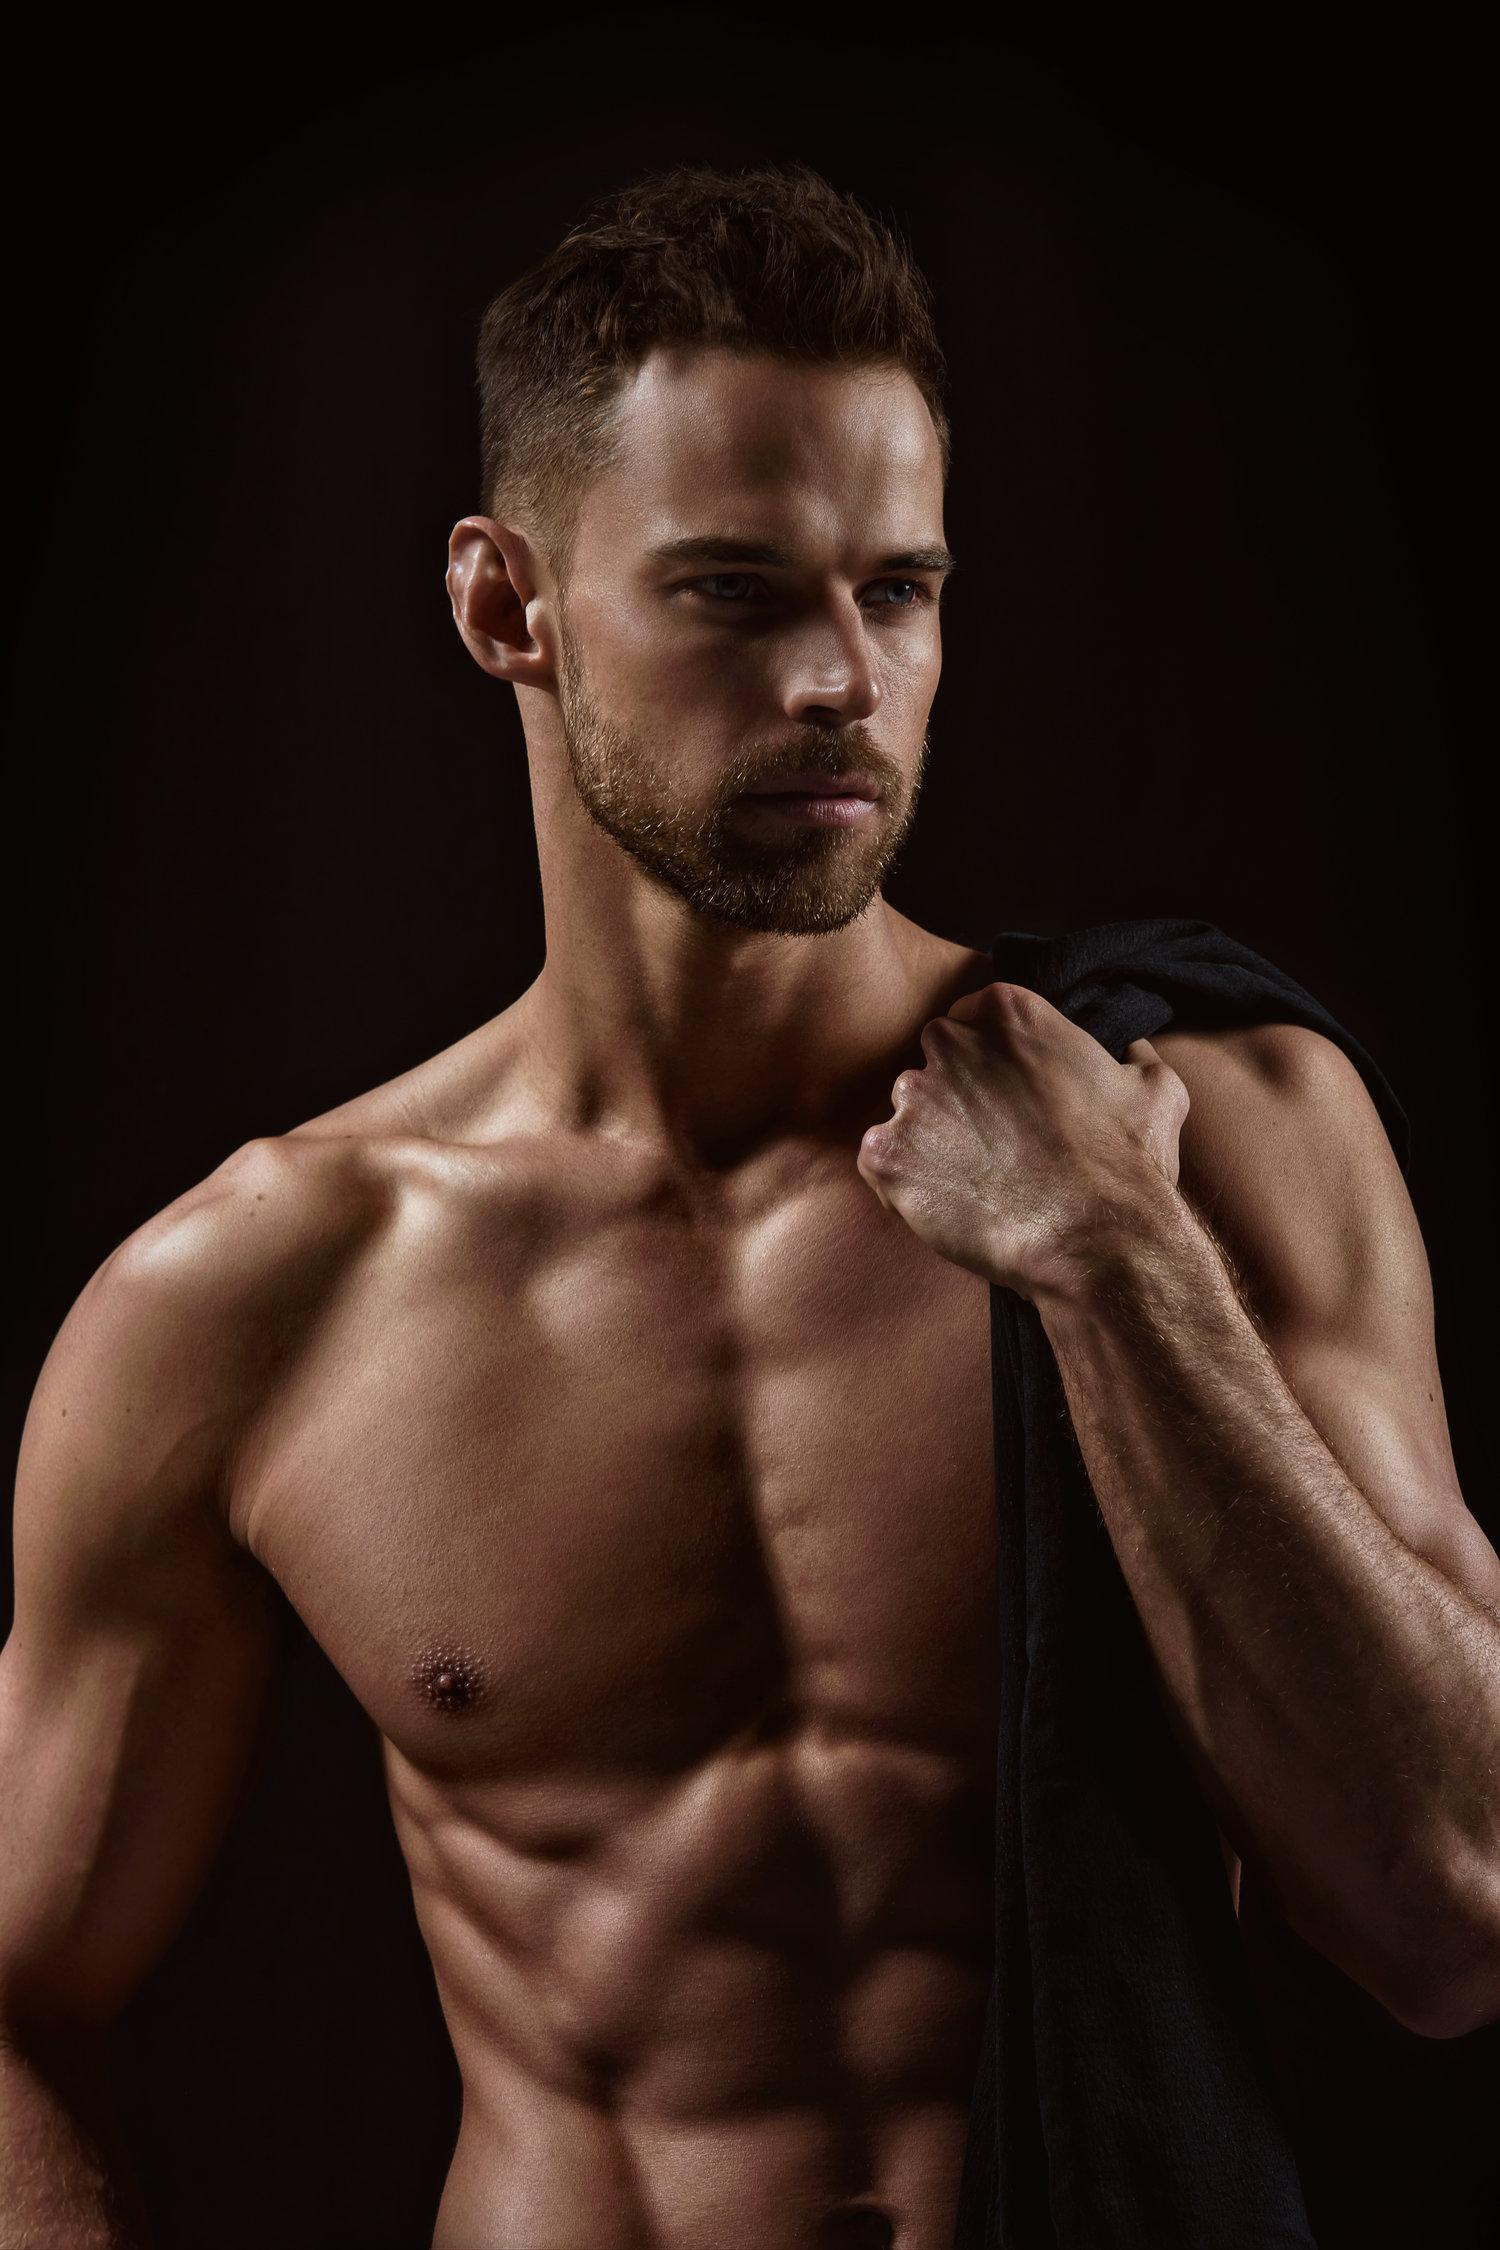 Adon Exclusive: Model Thom Panto By Scott Cushman